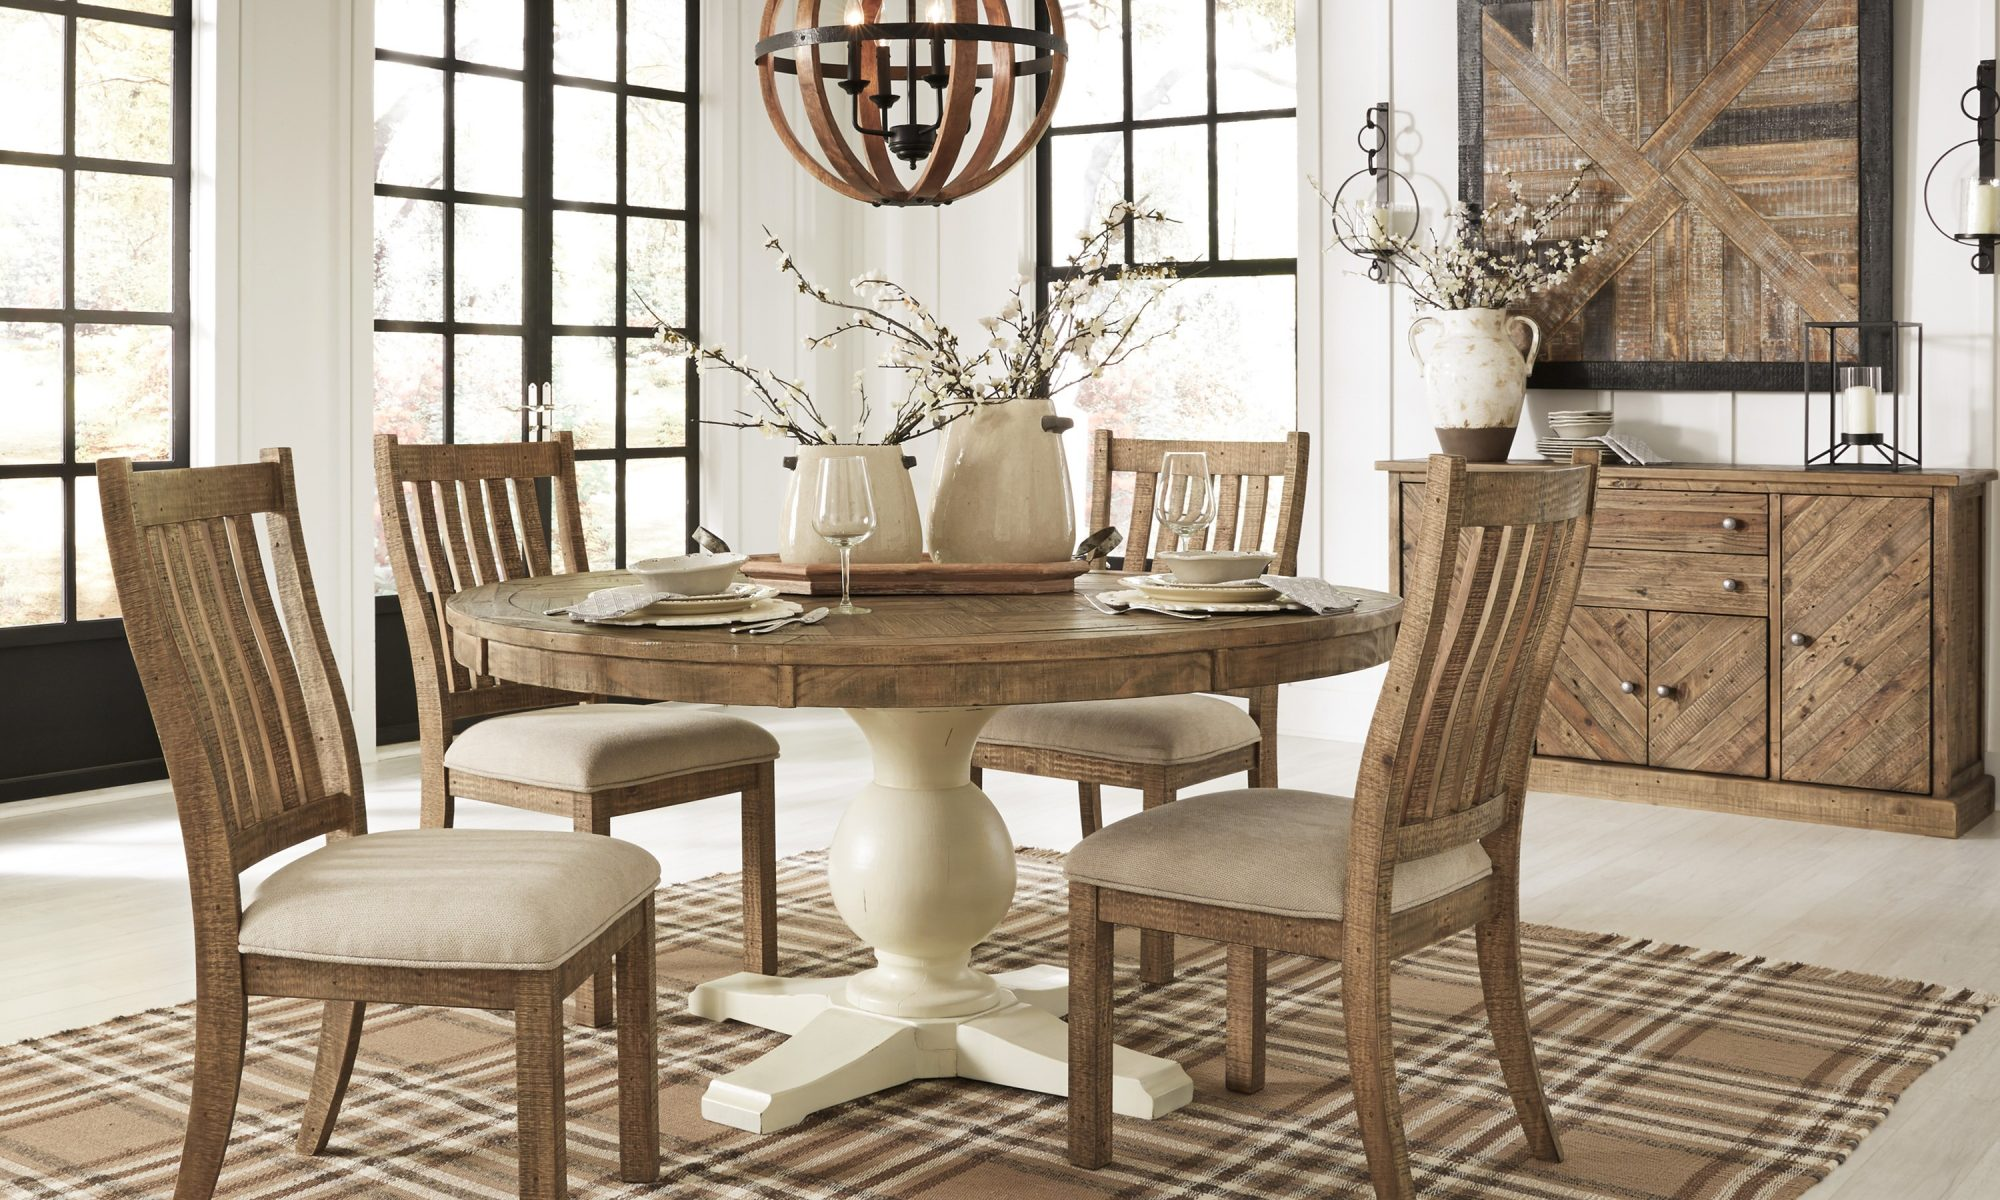 Meble stołowe D754,www.stylowemebleplock.pl